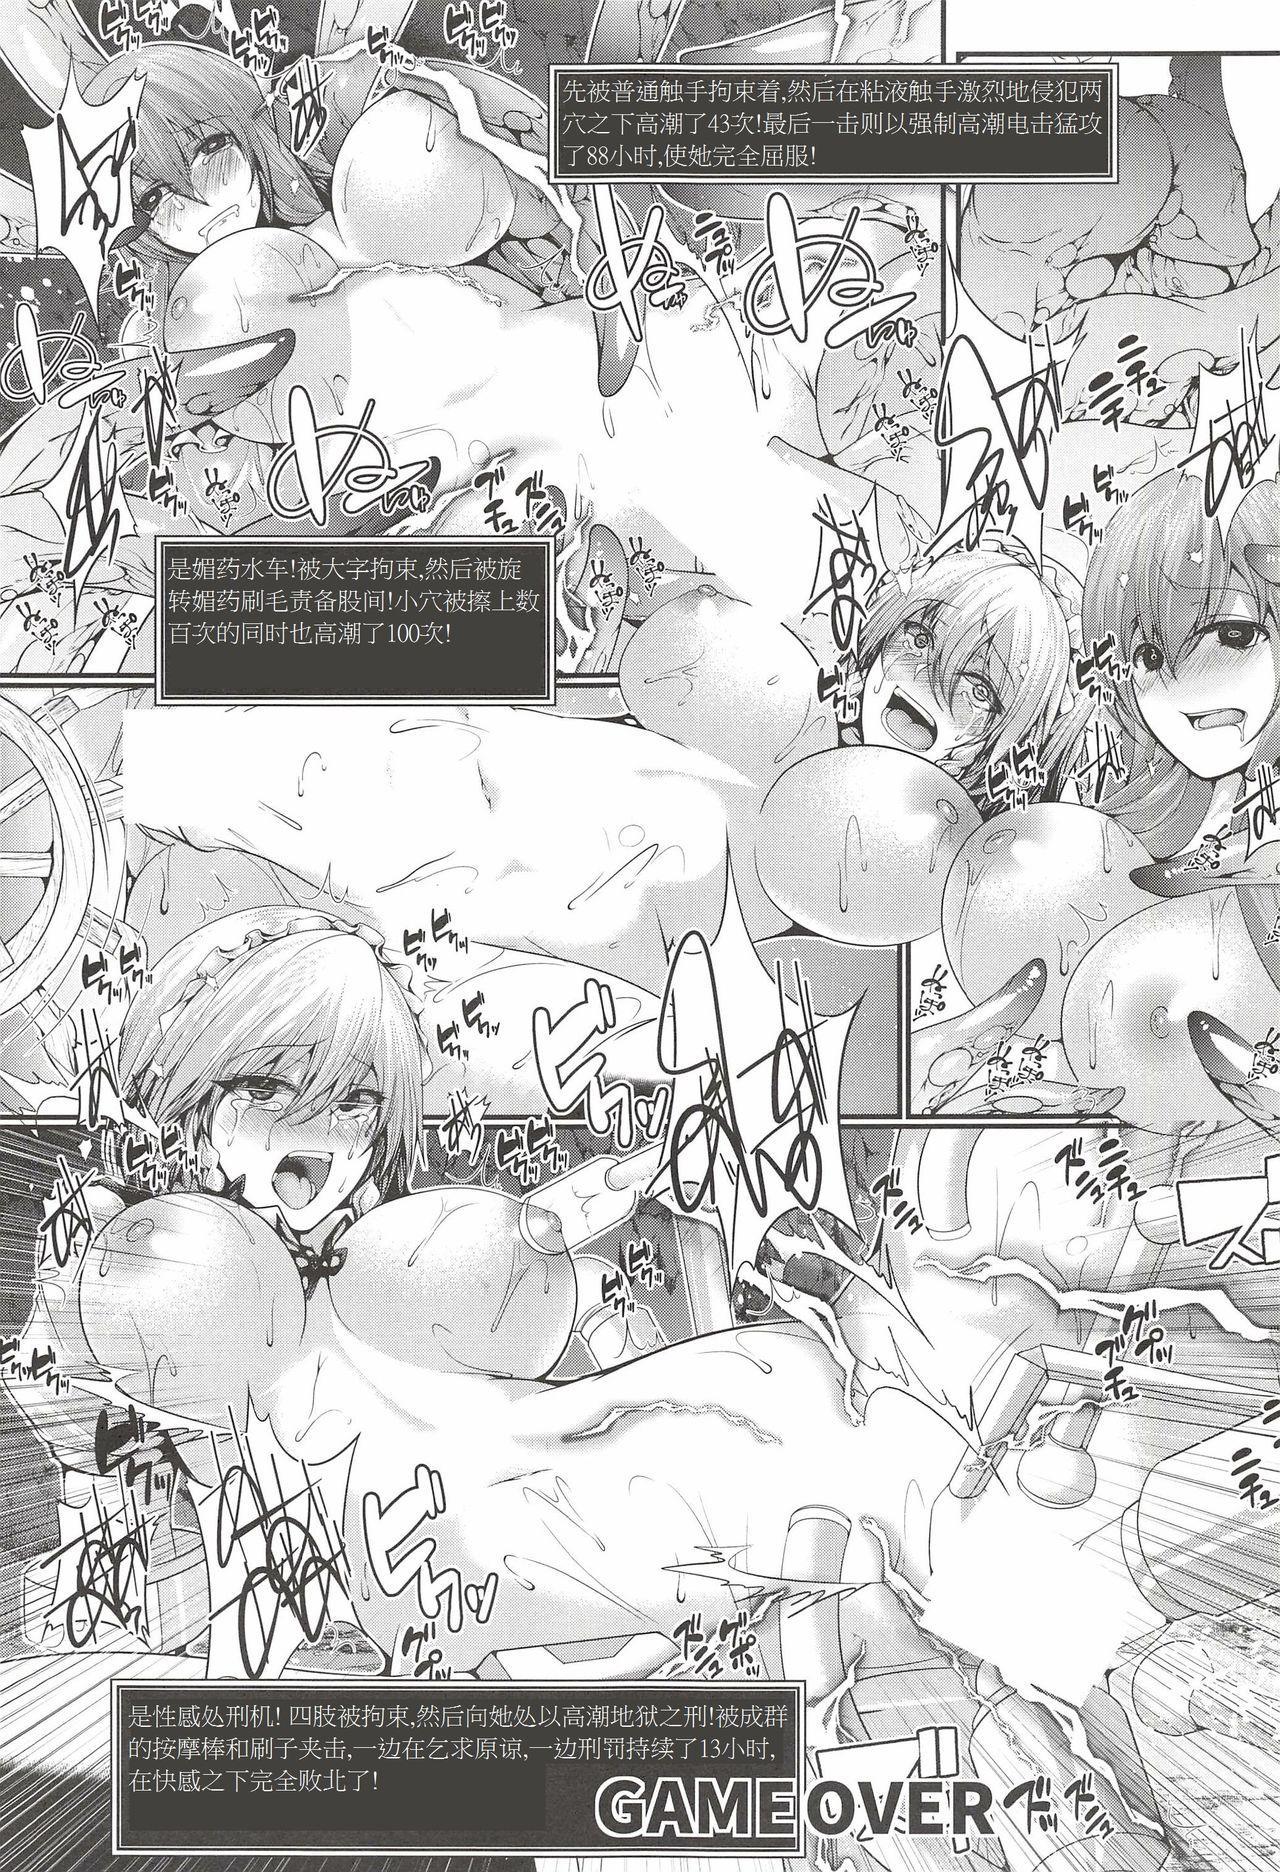 Sakuya-san Tachi no Ero Trap Dungeon 22